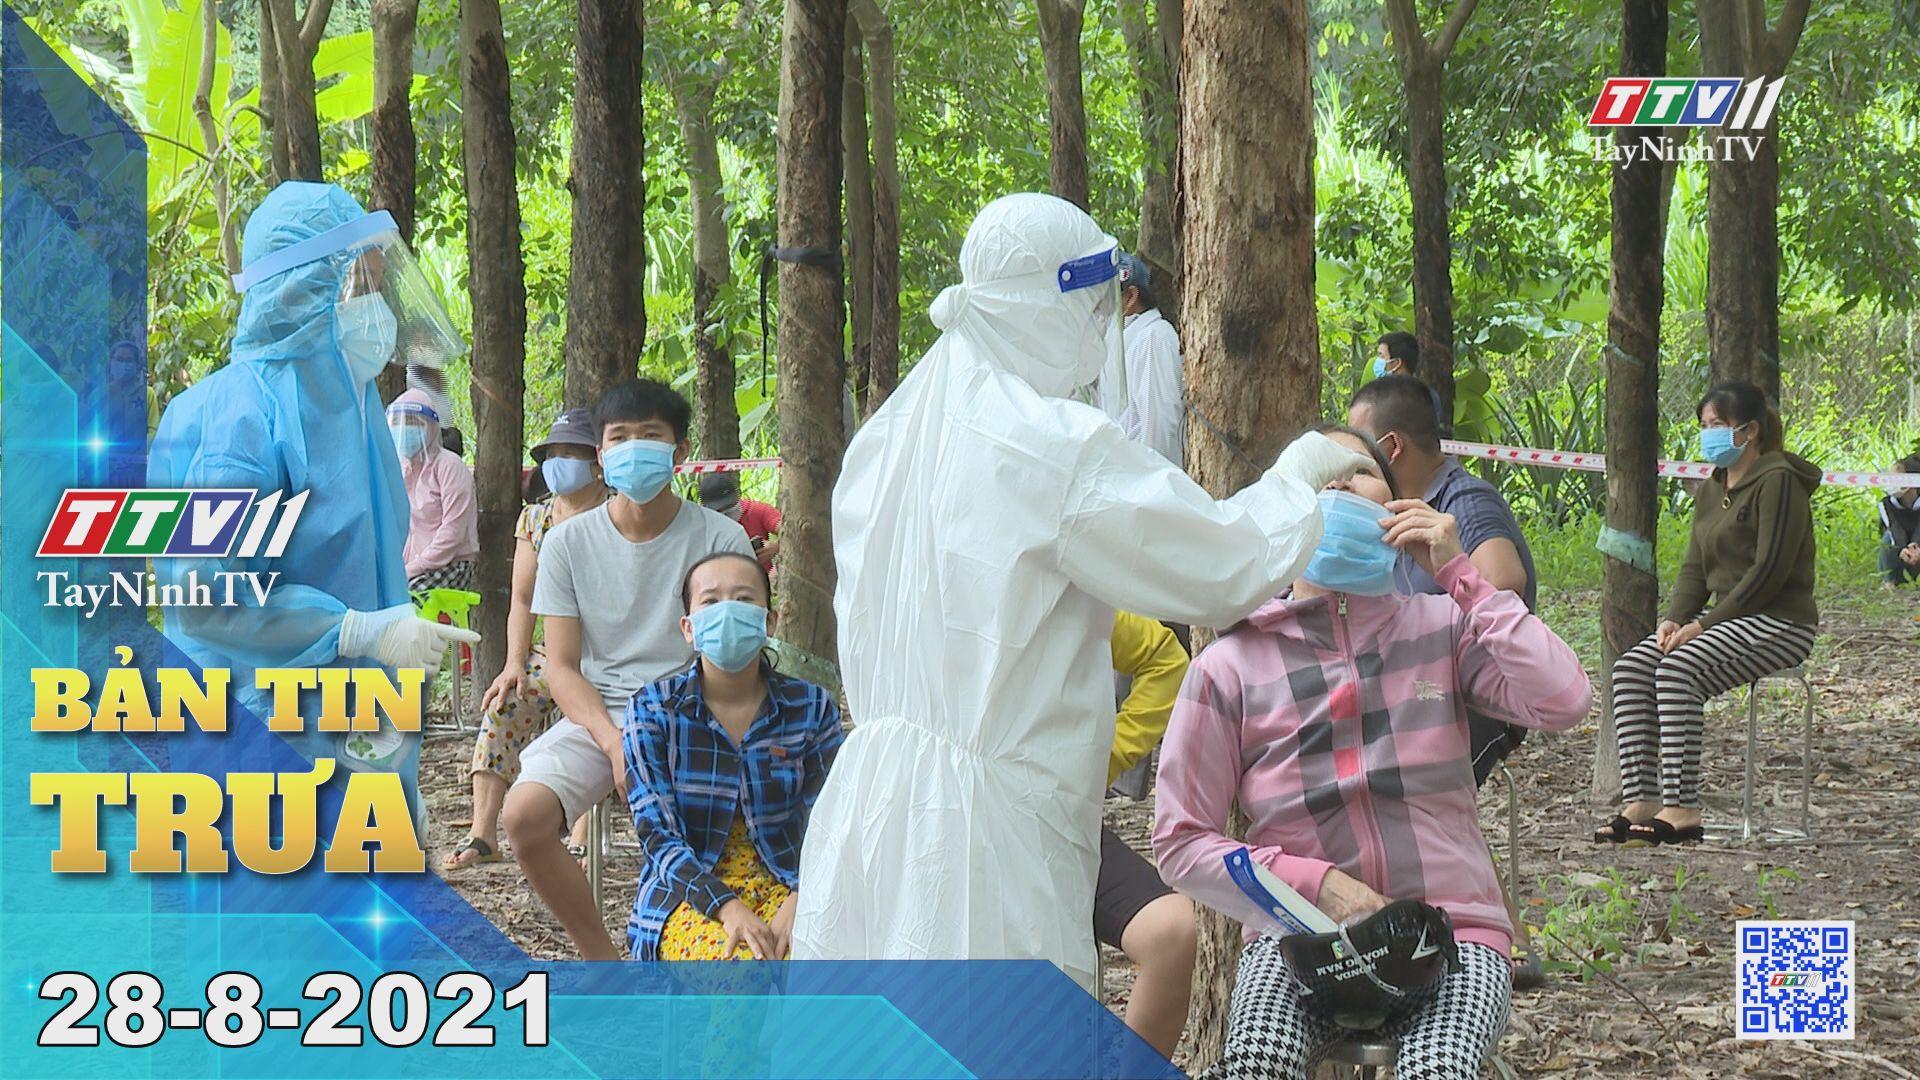 Bản tin trưa 28-8-2021 | Tin tức hôm nay | TayNinhTV